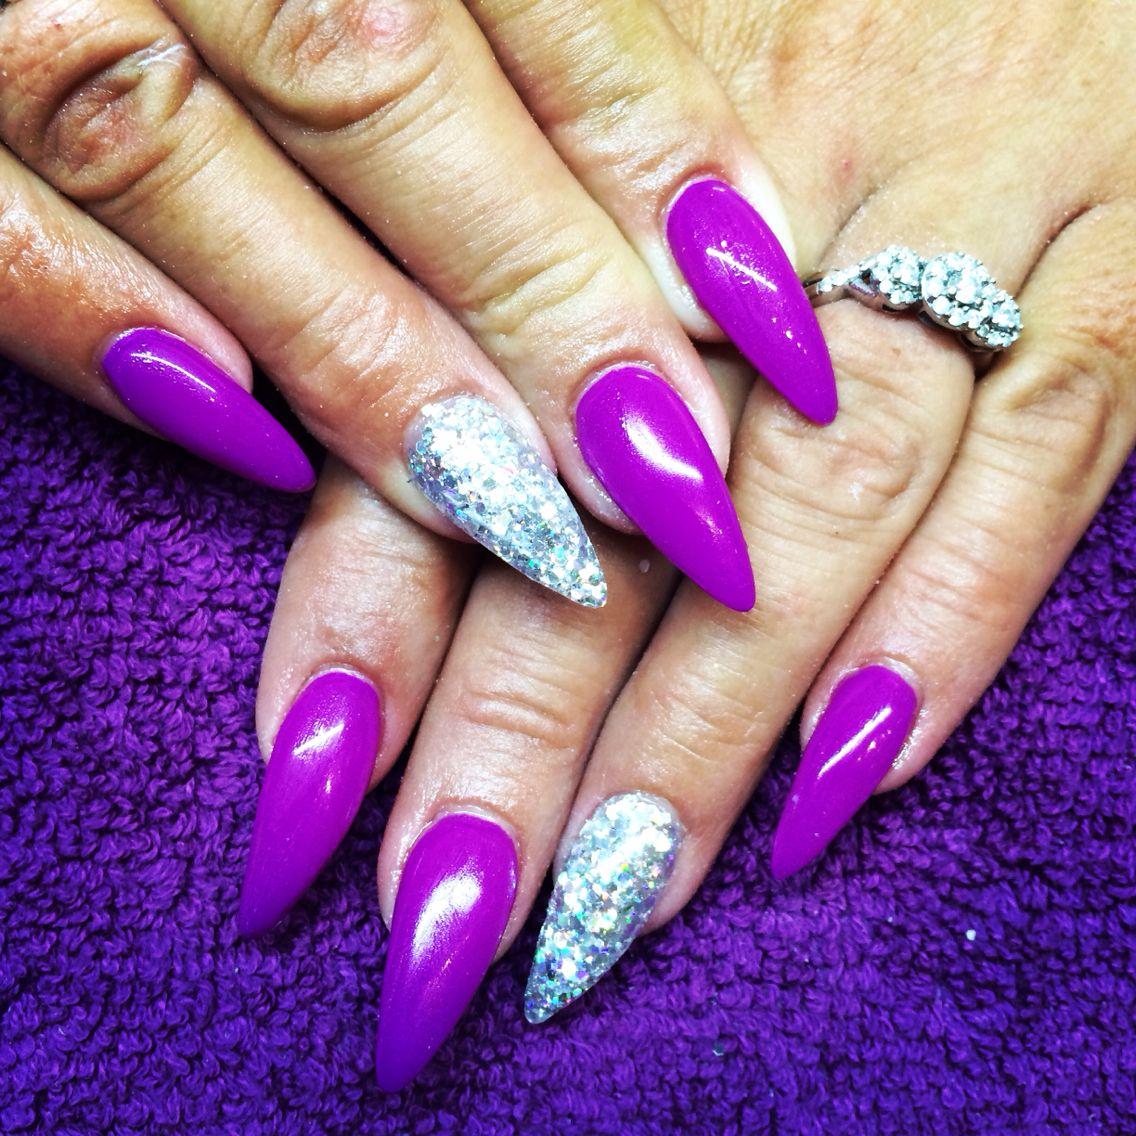 Blue glitter ombr 233 stiletto nails - Purple Stiletto With Holographic Accent Nail